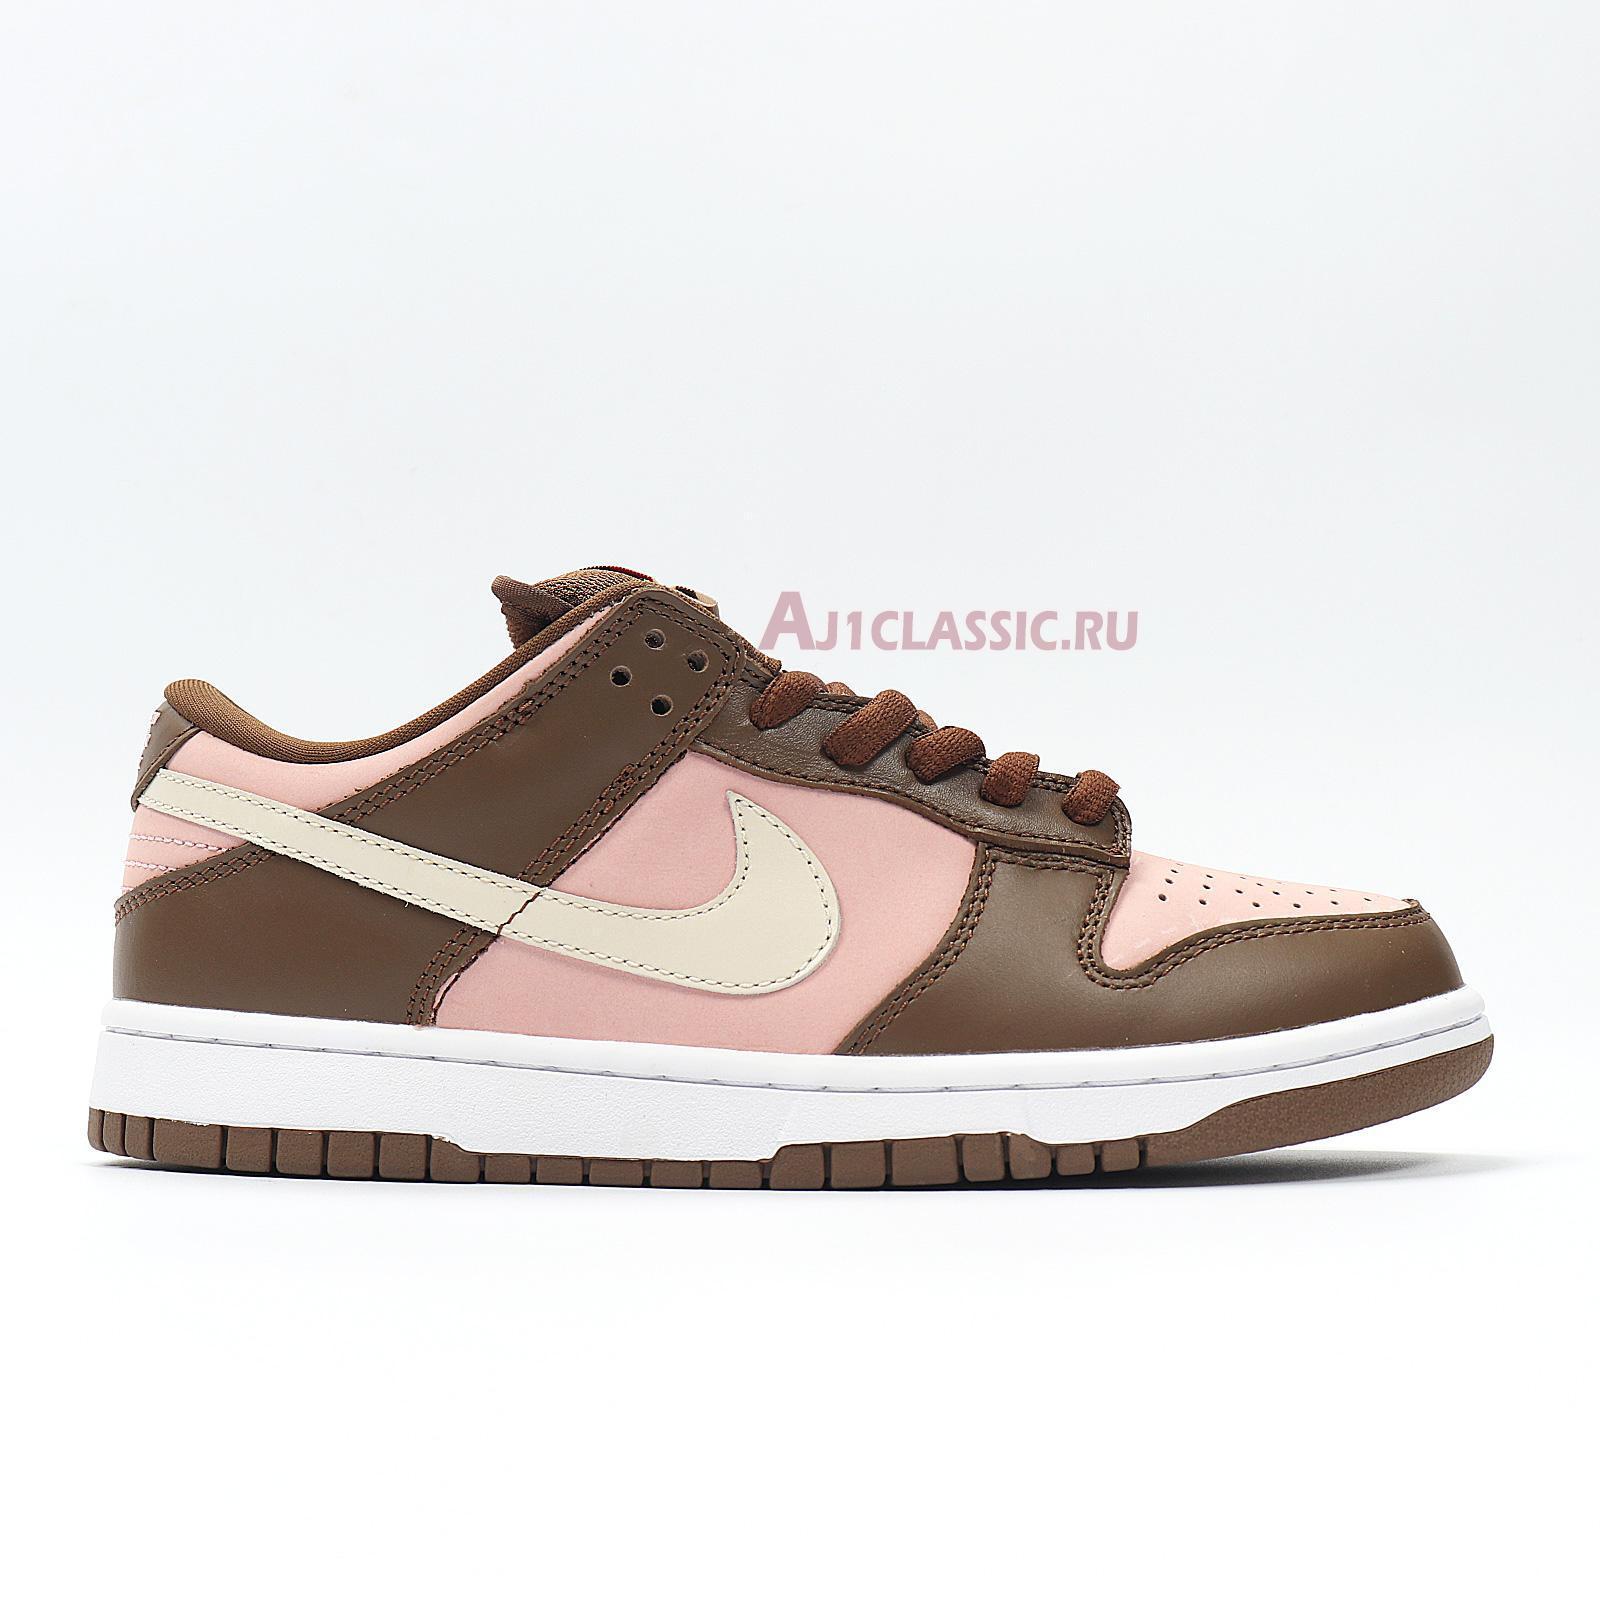 "Nike Stüssy x Dunk Low Pro SB ""Cherry"" 304292-671"